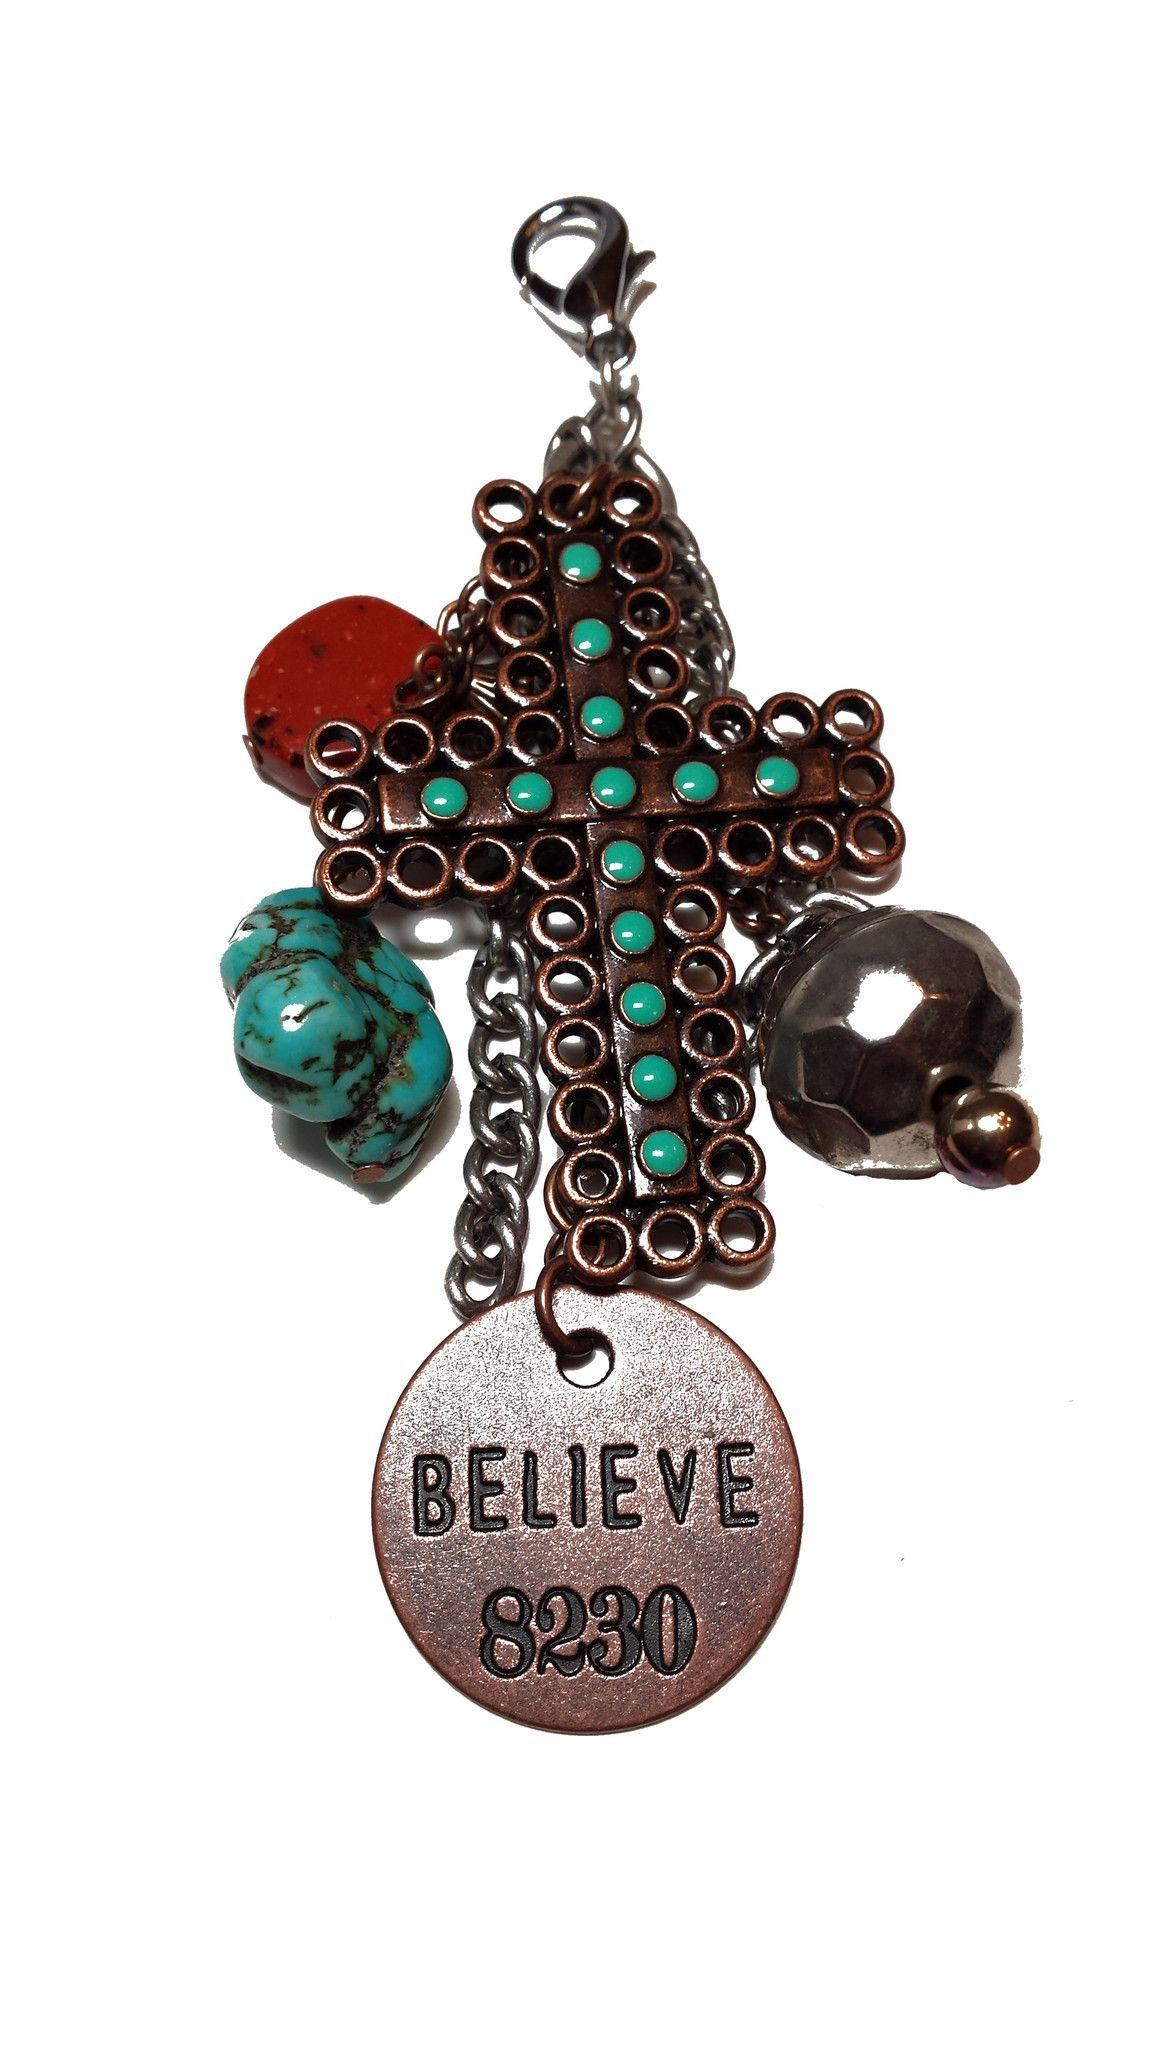 Turquoise Cross Believe 8230 Cluster Pendant